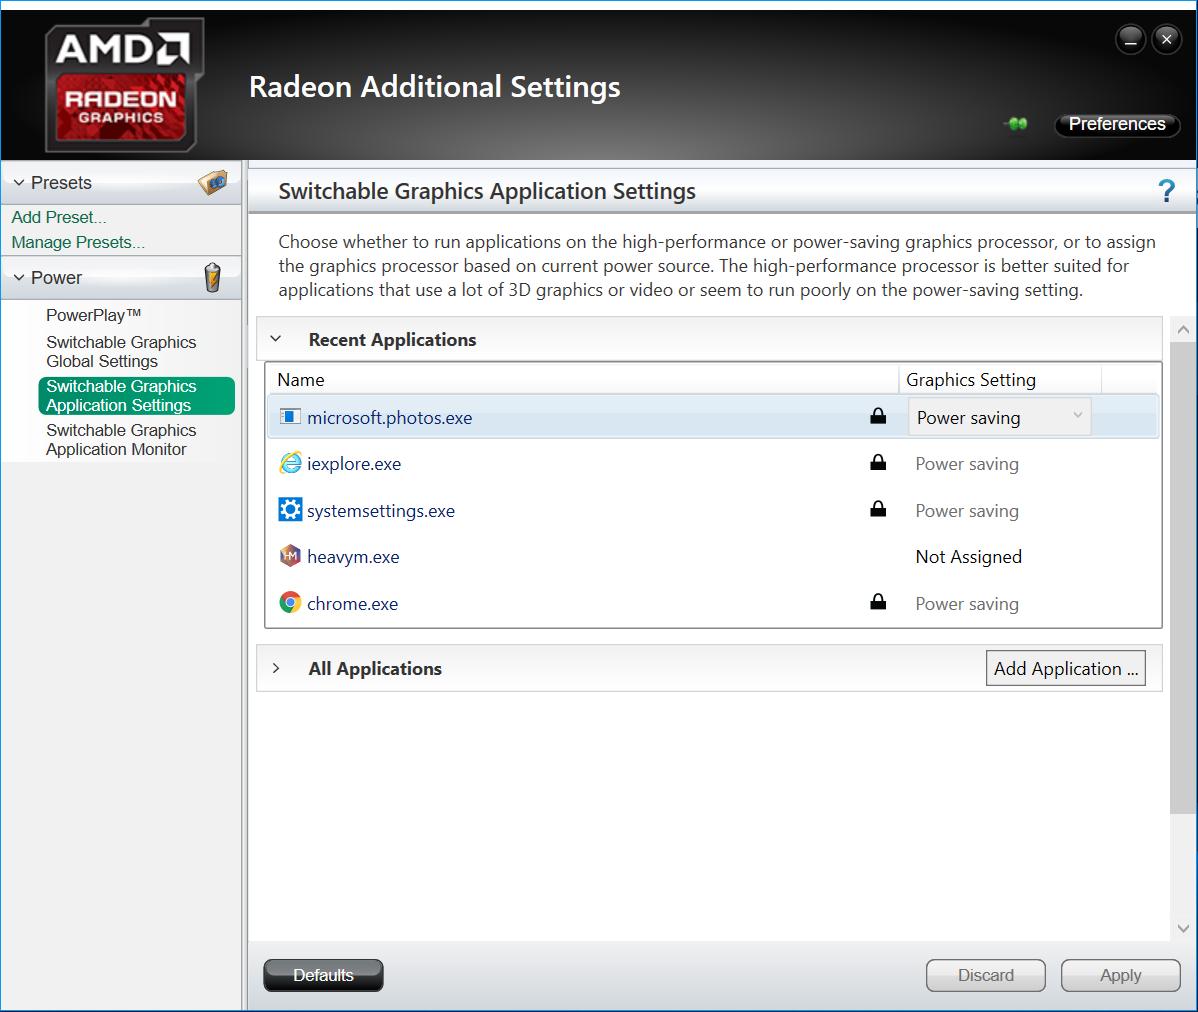 RADEON graphics settings